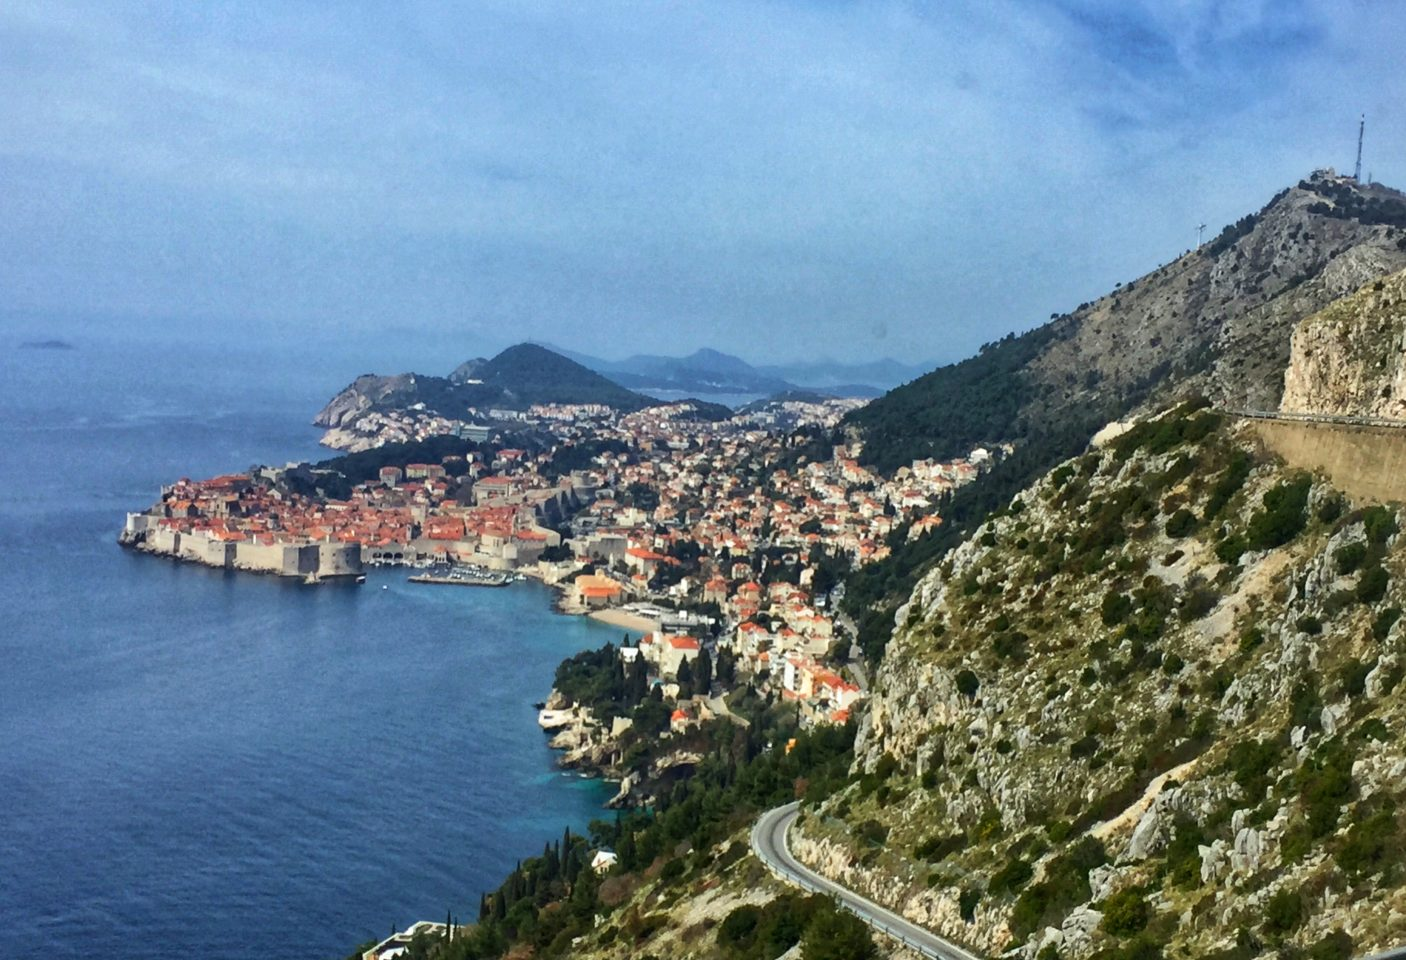 Dubrovnik on the Adriatic coast of Croatia